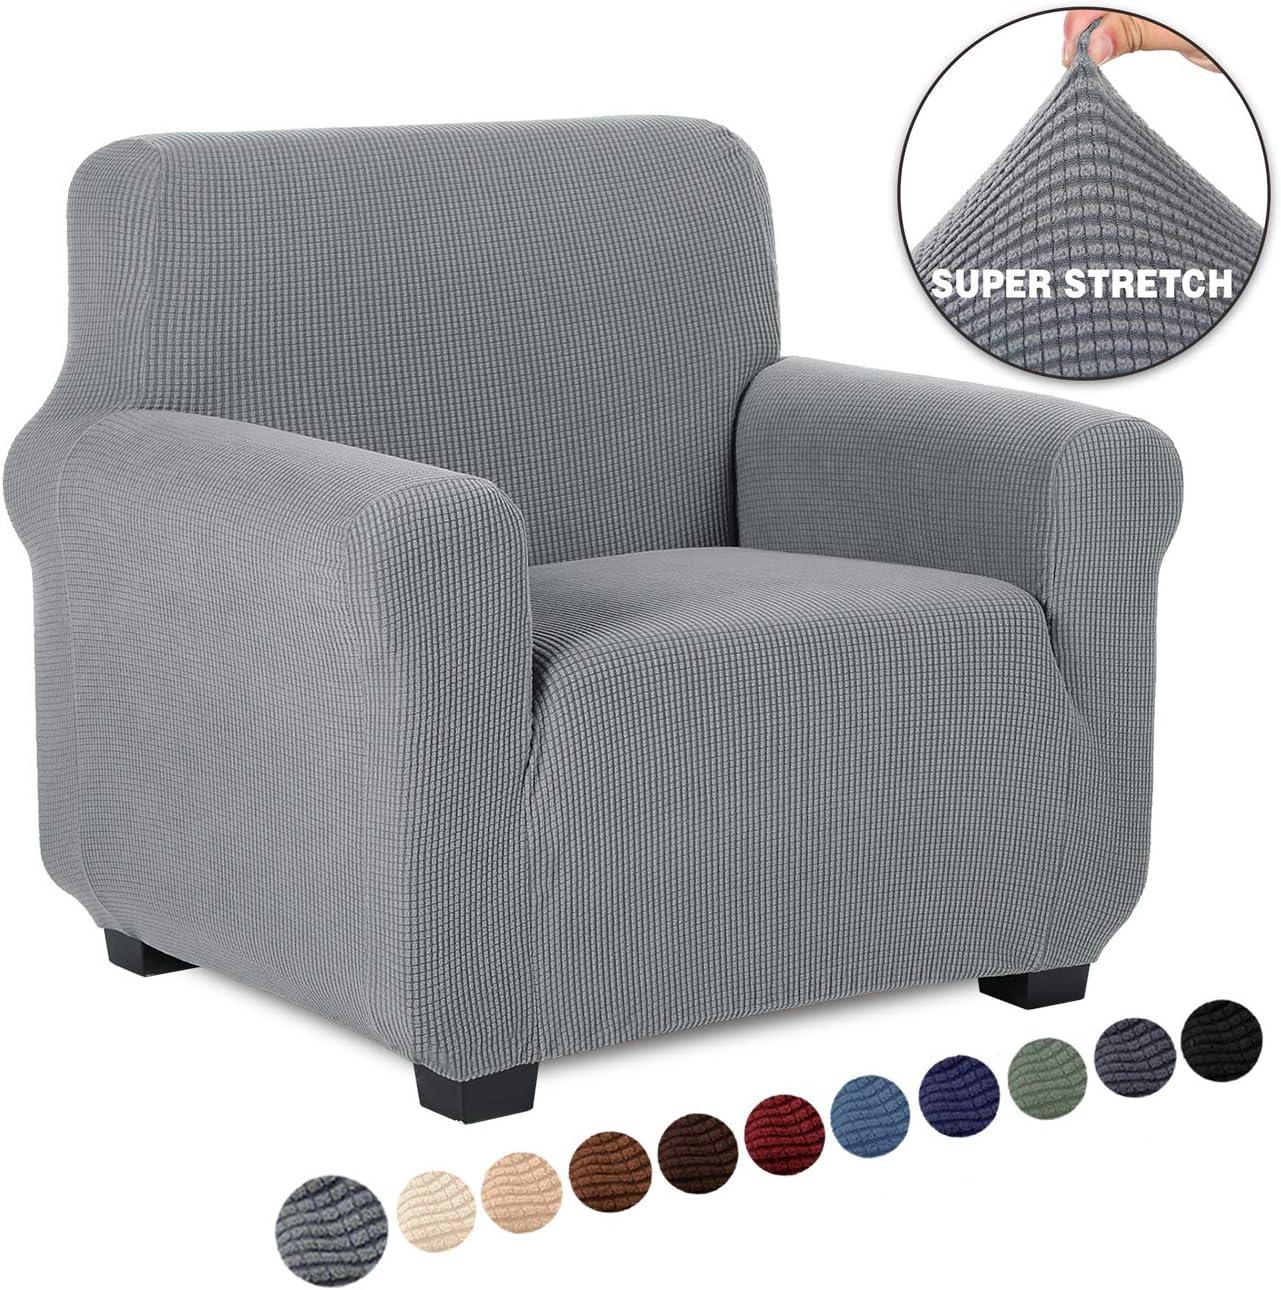 TIANSHU Funda de sillón,Material Jacquard poliéster y Elastano Fundas de sofá Suaves Resistentes?Funda de sillón?Gris Claro?